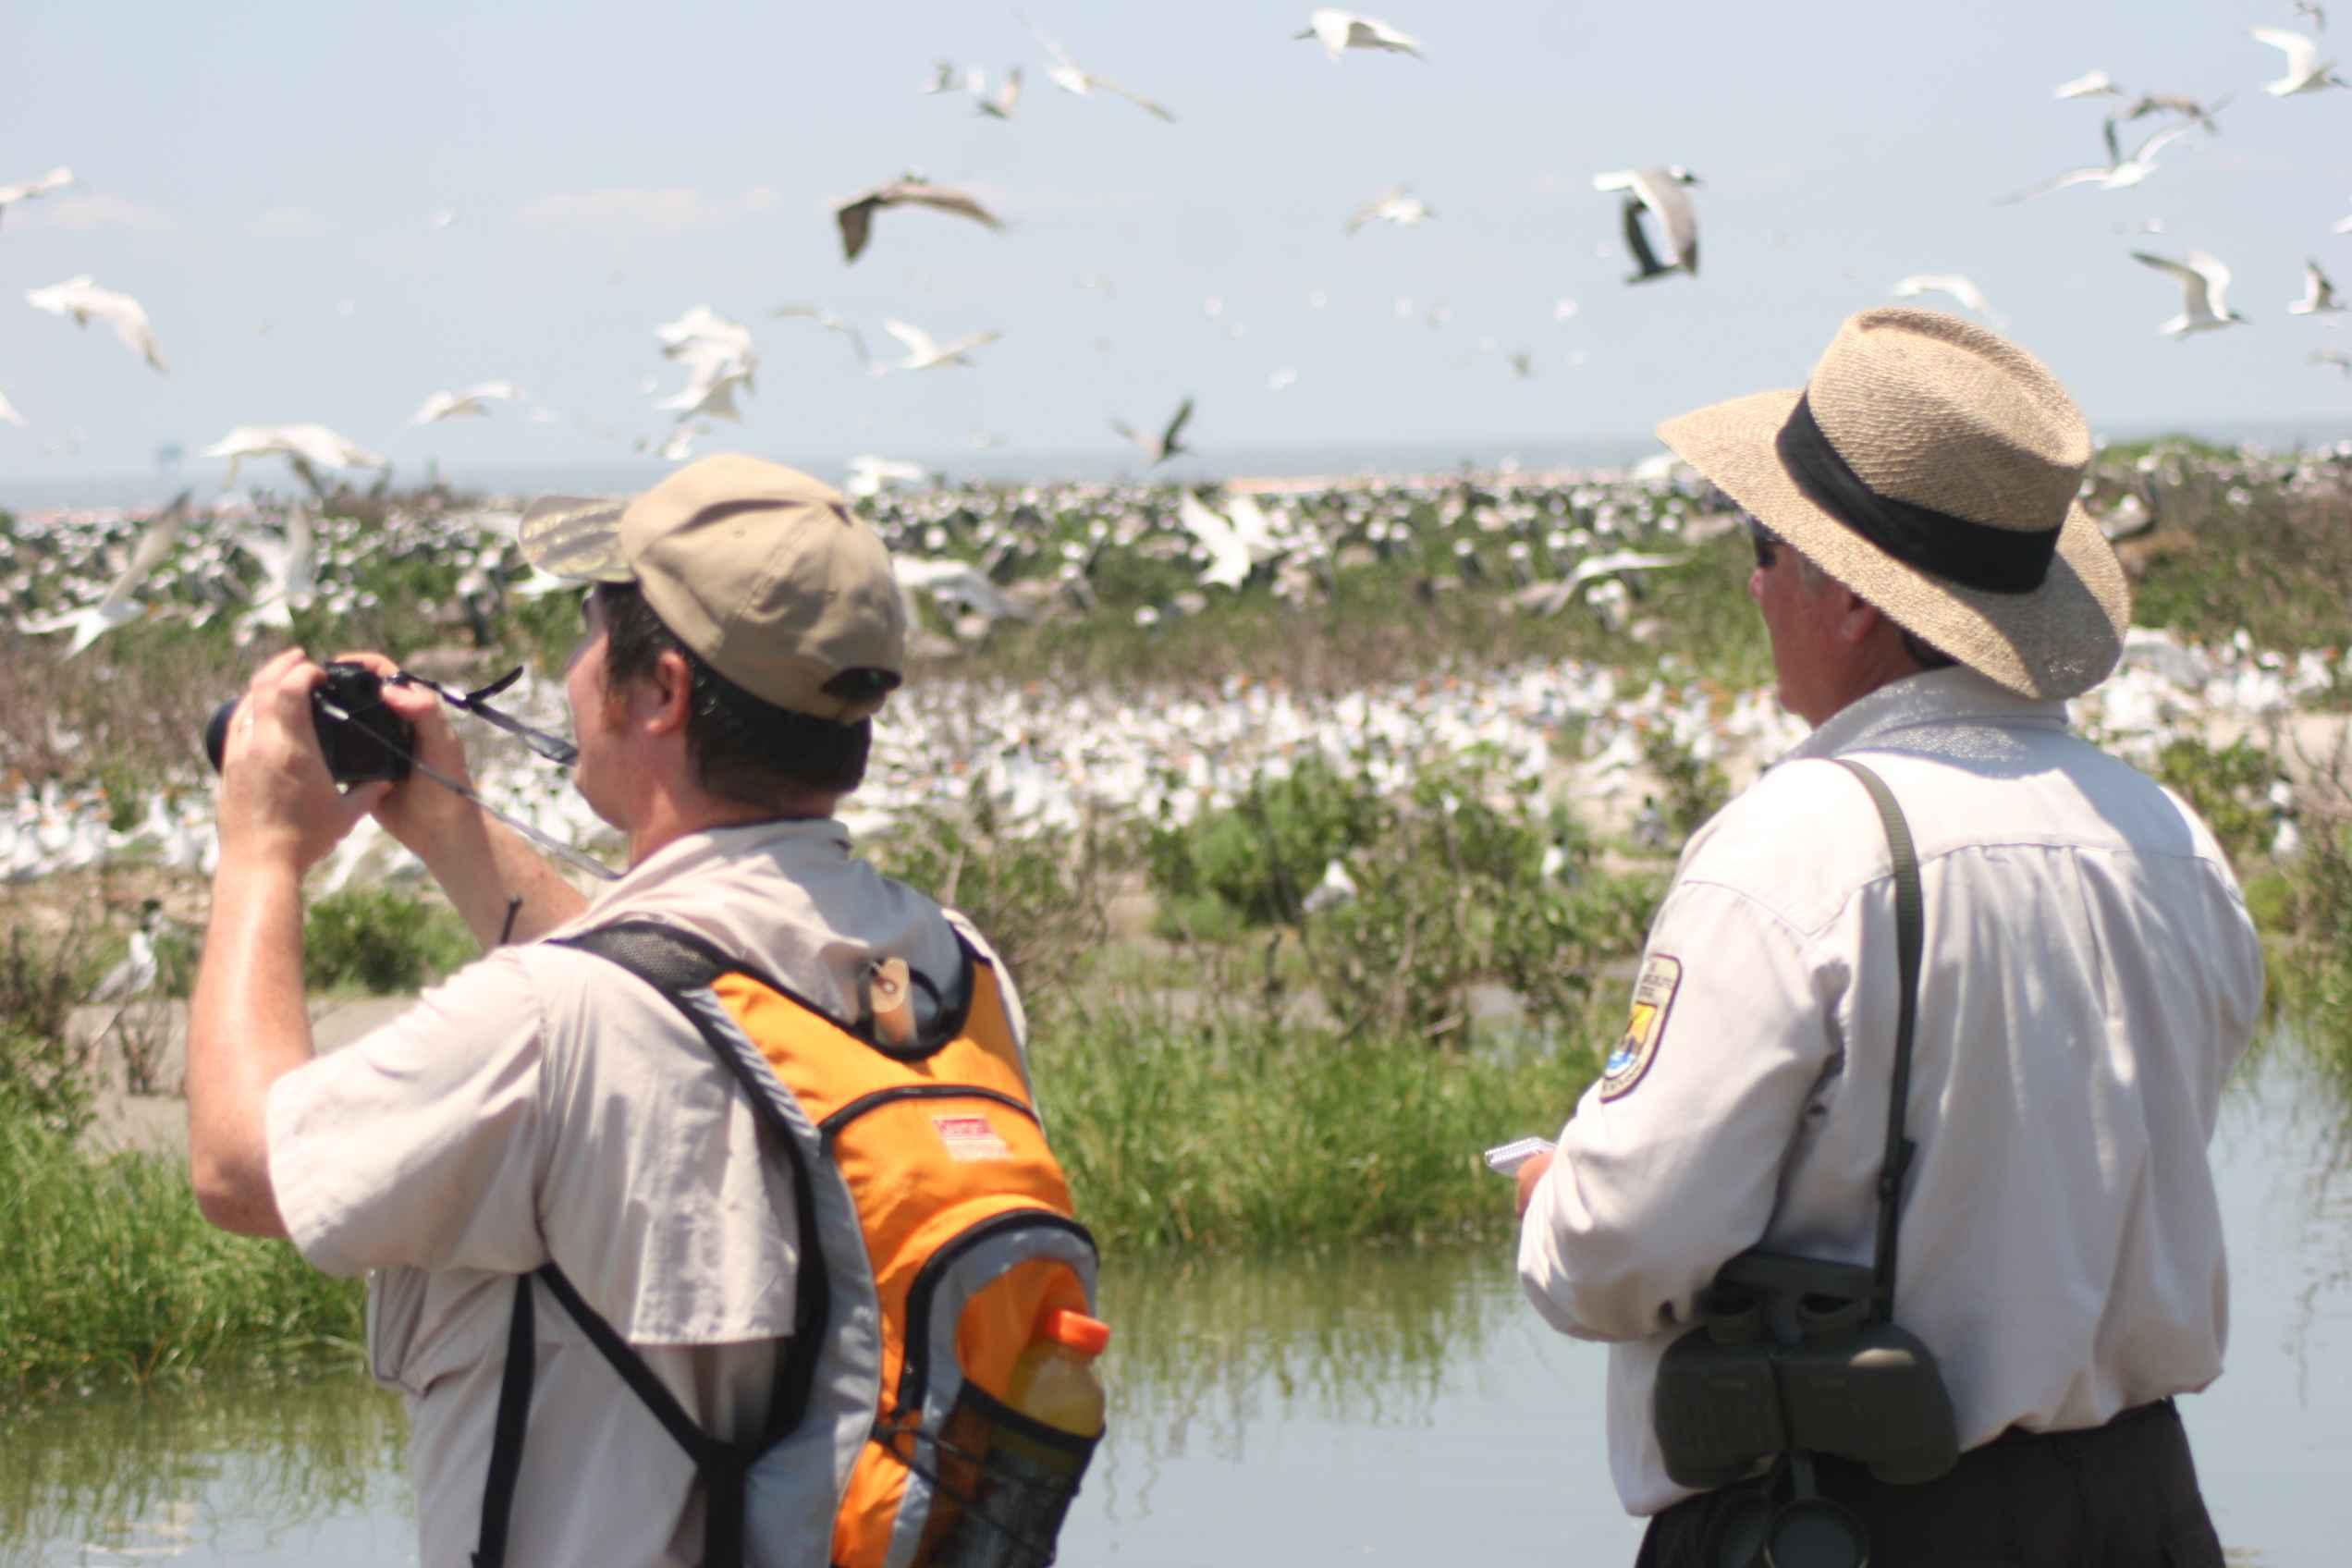 bird watching dating Activities listing » bird watching viewing 1 - 3 of 3: bird watching dating (3) boating dating (6) bunji jumping dating (1) camping dating (16) canyoning dating (7.